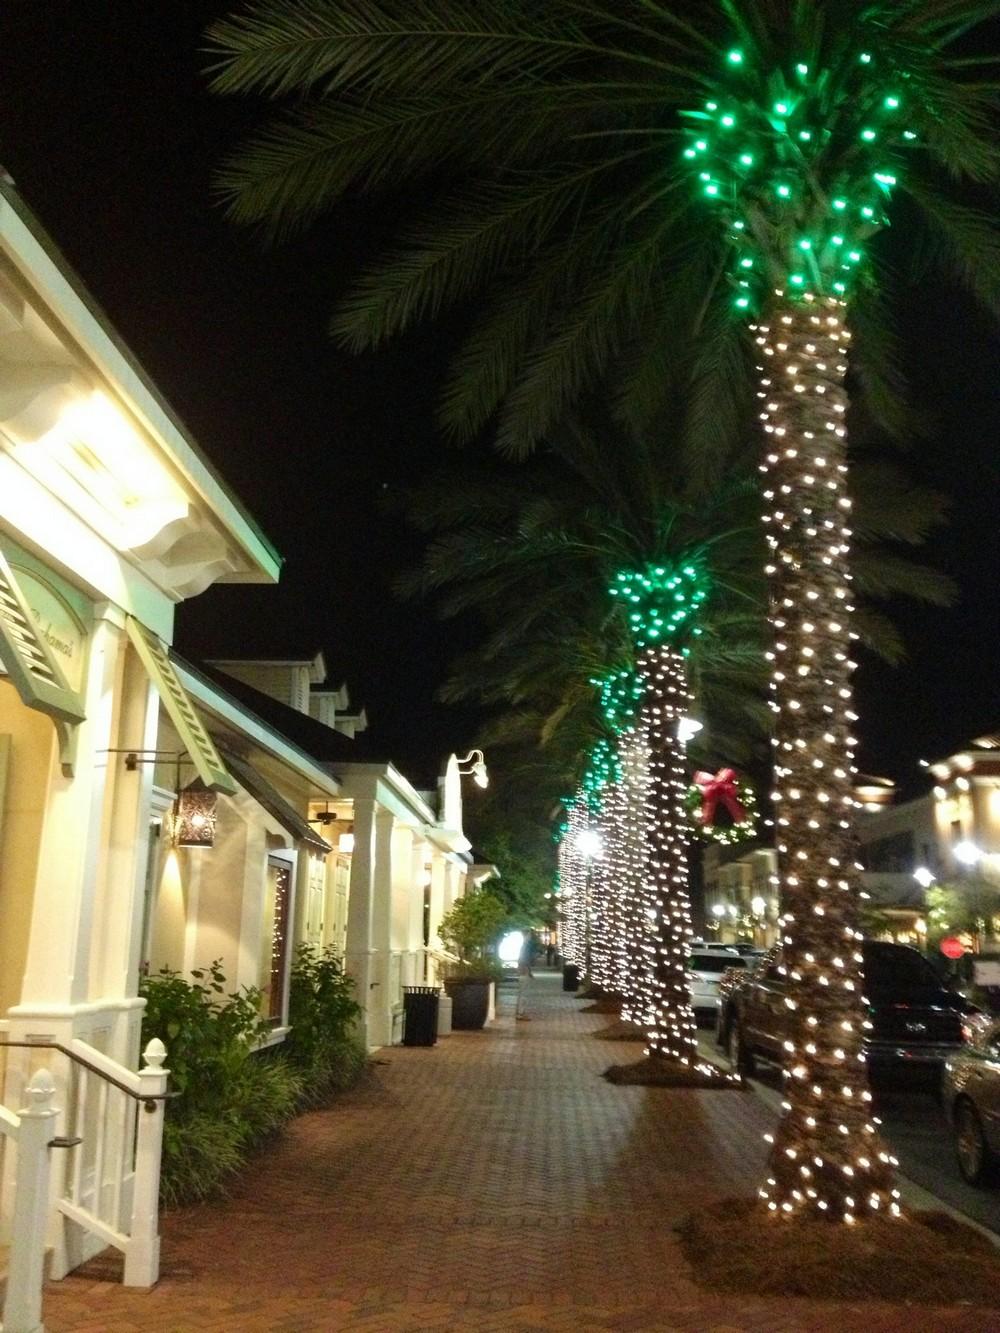 Holiday Lighting & Decor - The Lighting Company | Serving the ...